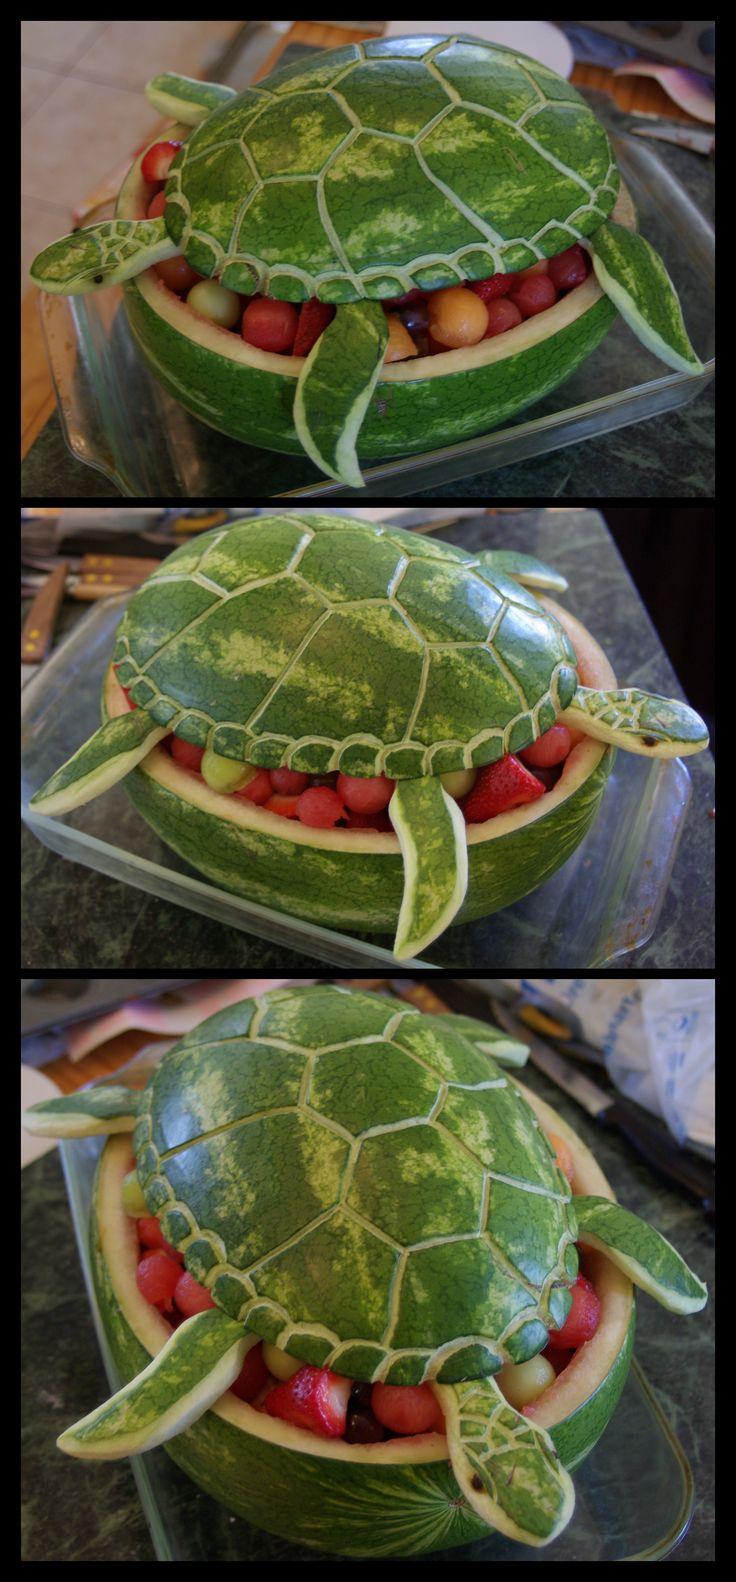 Watermelon Sea Turtle by ~Ti-7-4Raven on deviantART